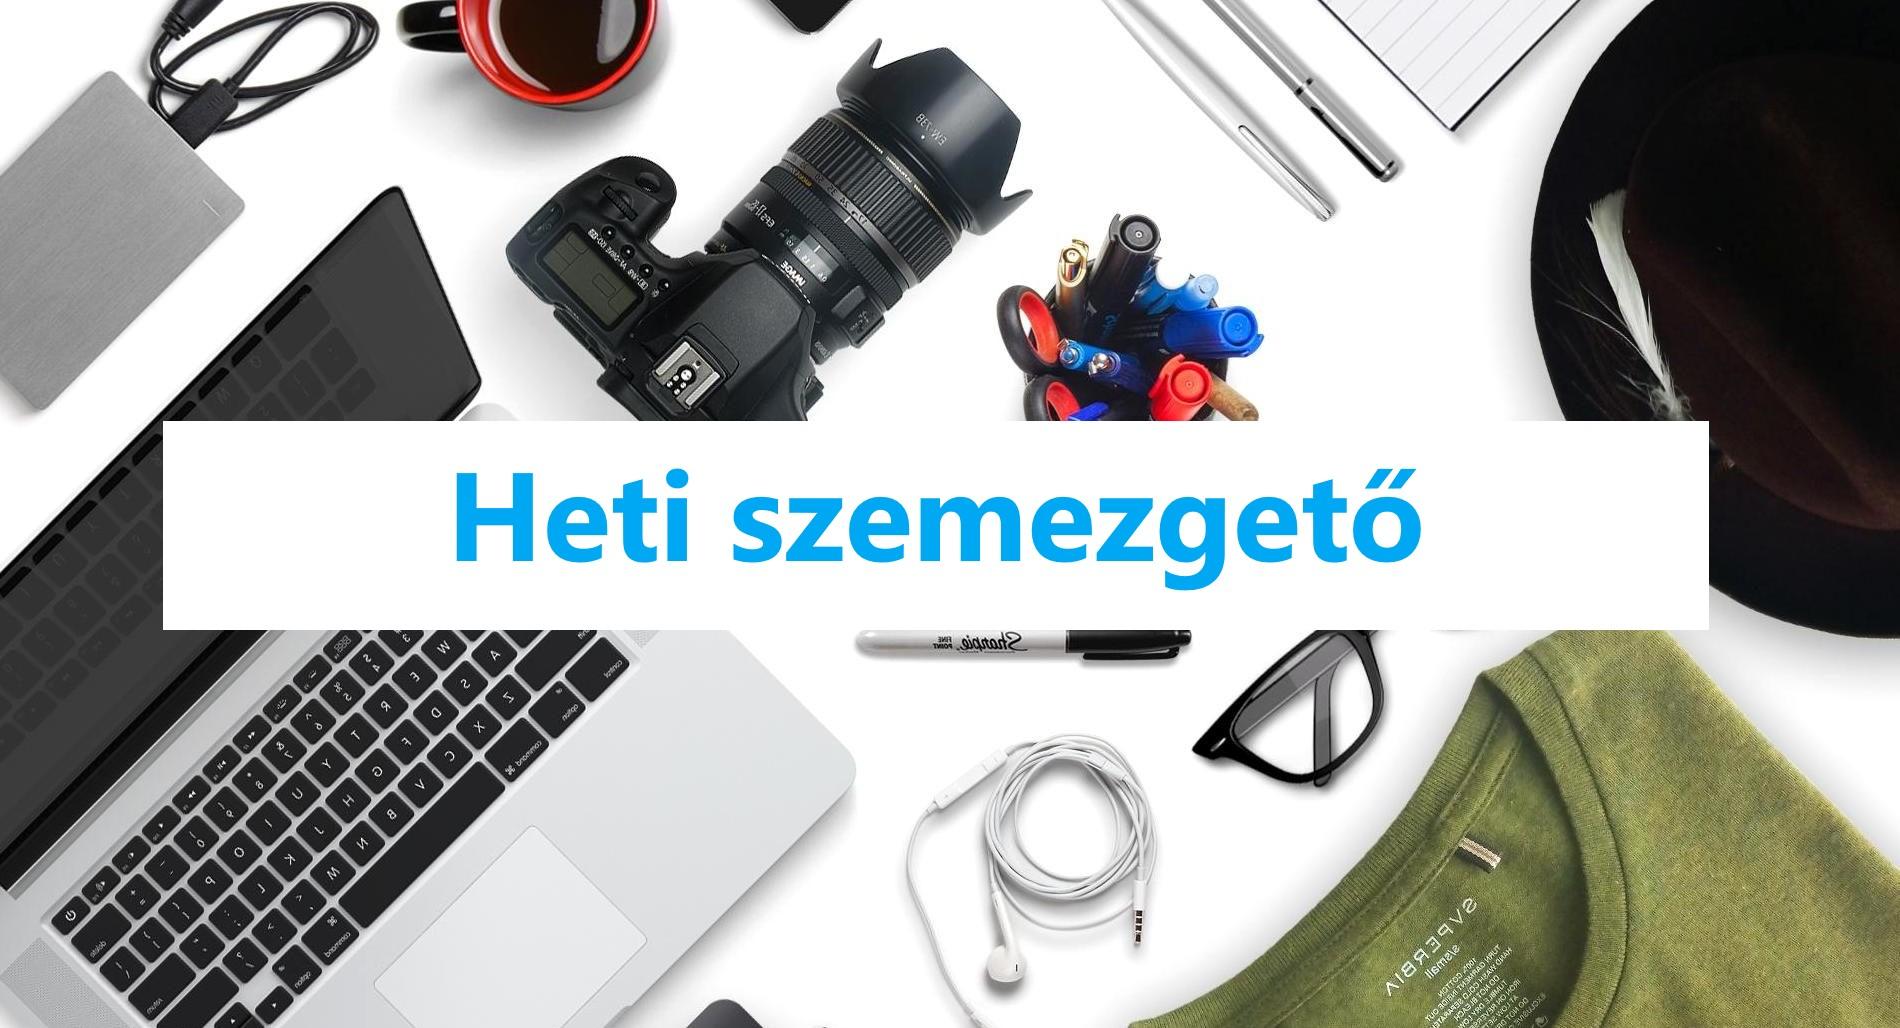 heti_szemezgeto_uj_126.jpg